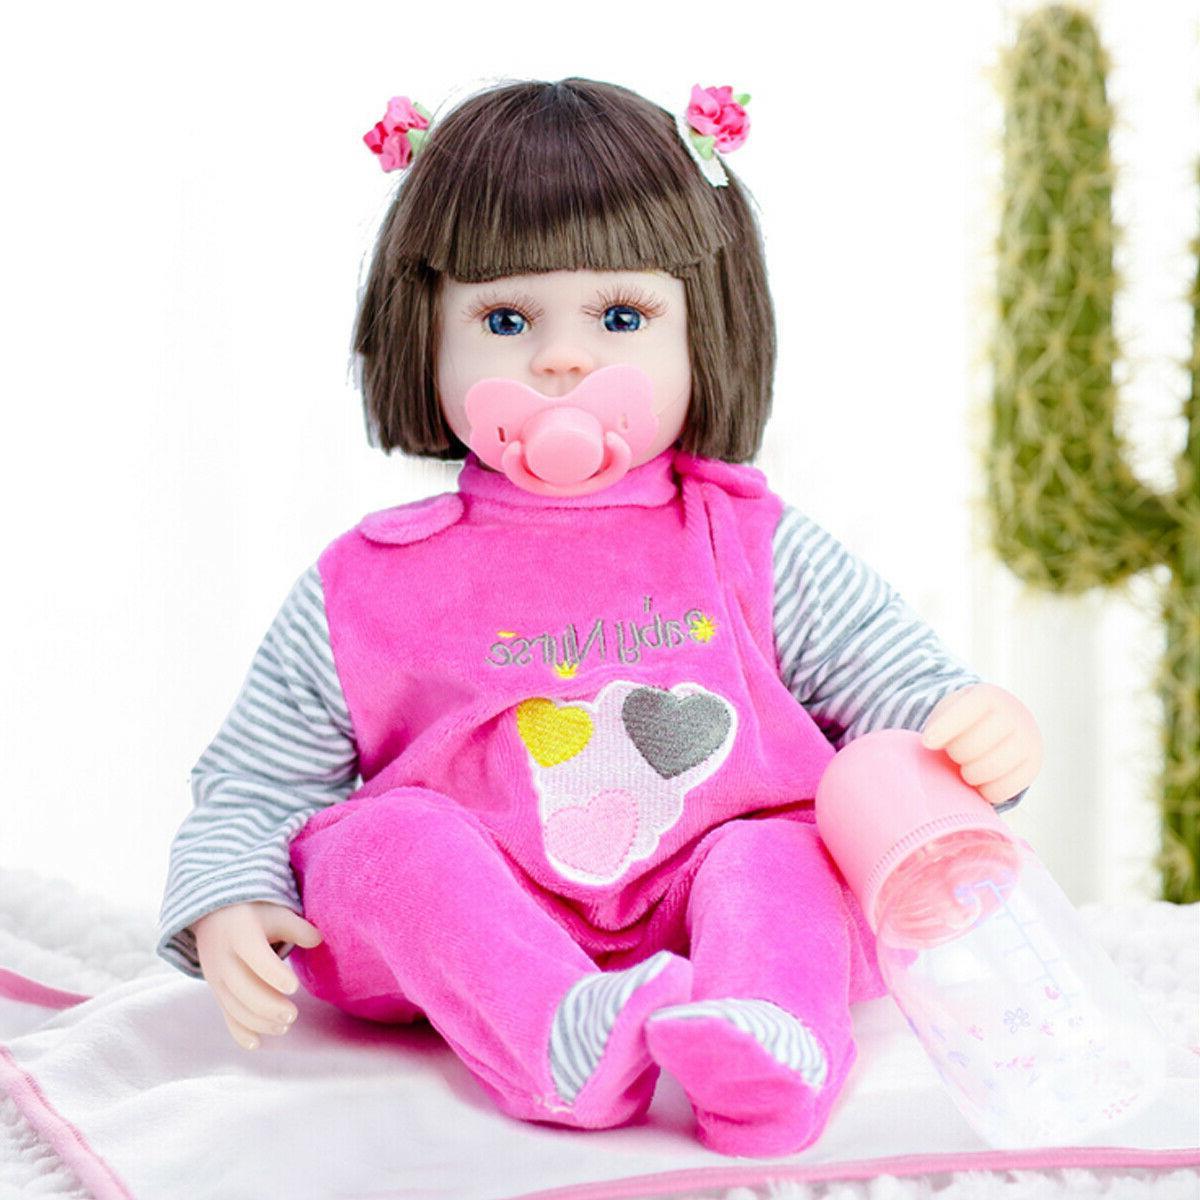 45cm Real Life Reborn Newborn Vinyl Silicone Baby Girl Dolls